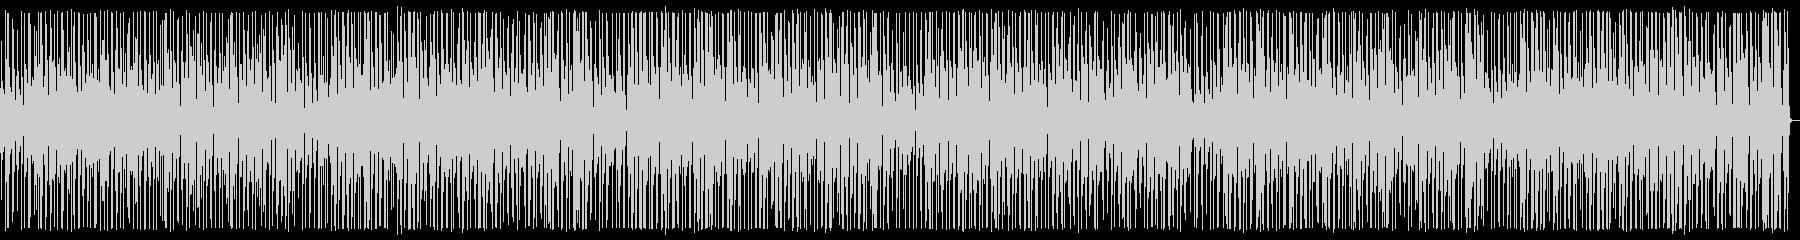 YouTube アコギ・カホン・日常の未再生の波形